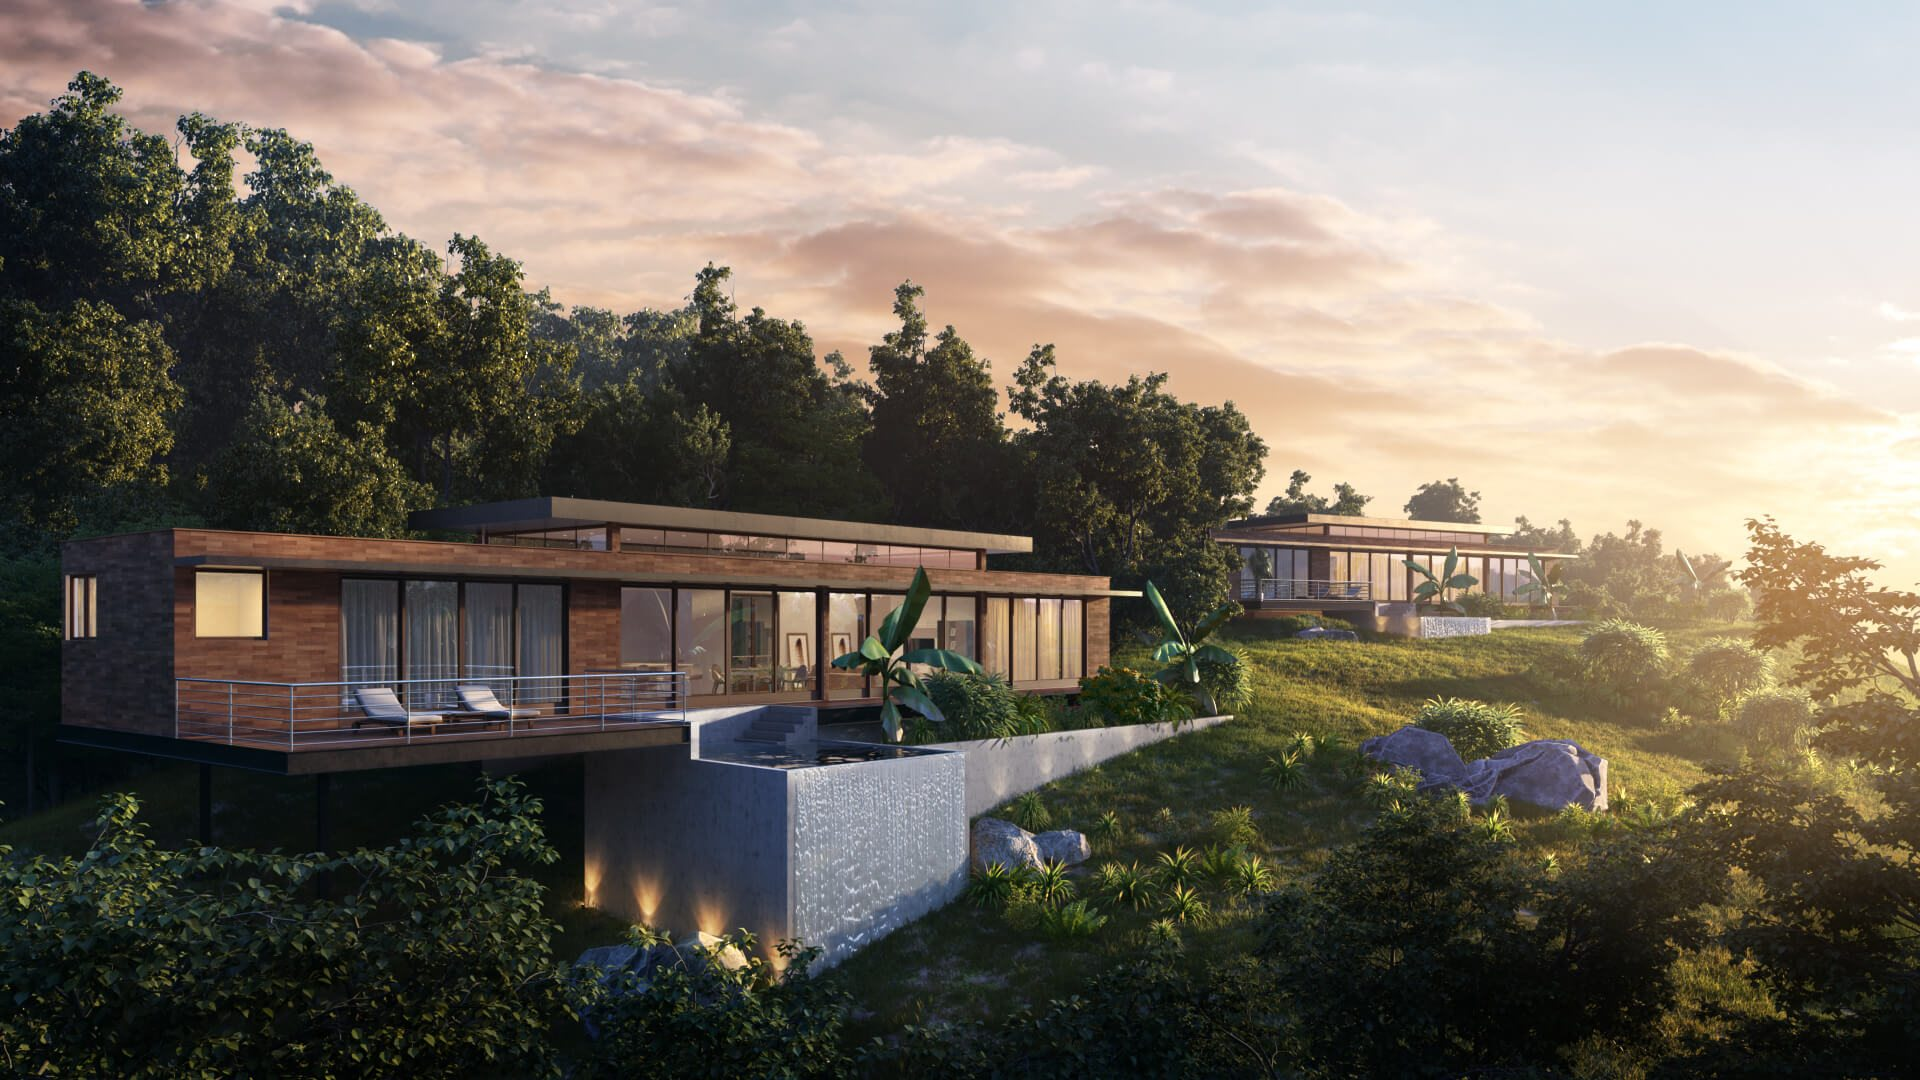 3D Architectural Visualization for an Elegant Resort Hotel